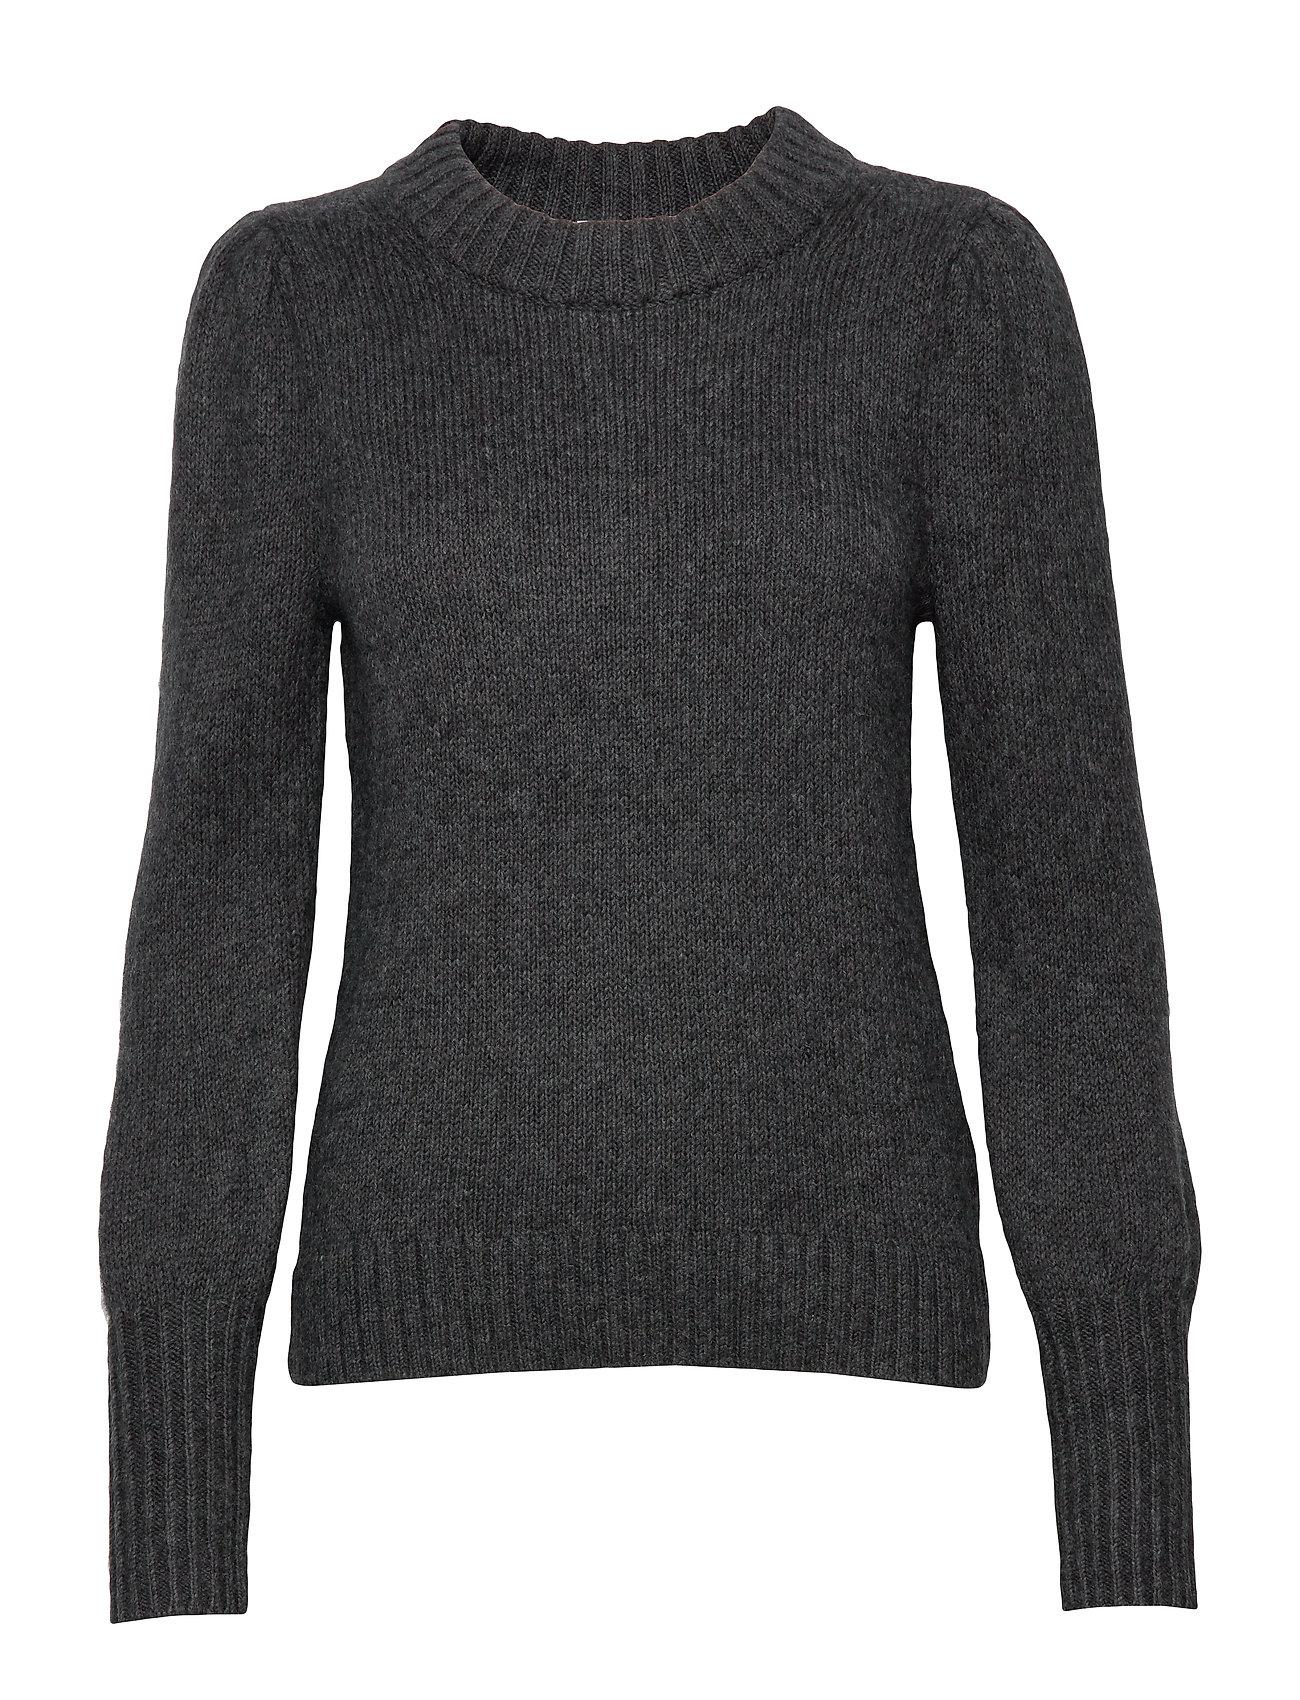 GAP Puff Sleeve Crewneck Sweater - CHARCOAL HEATHER